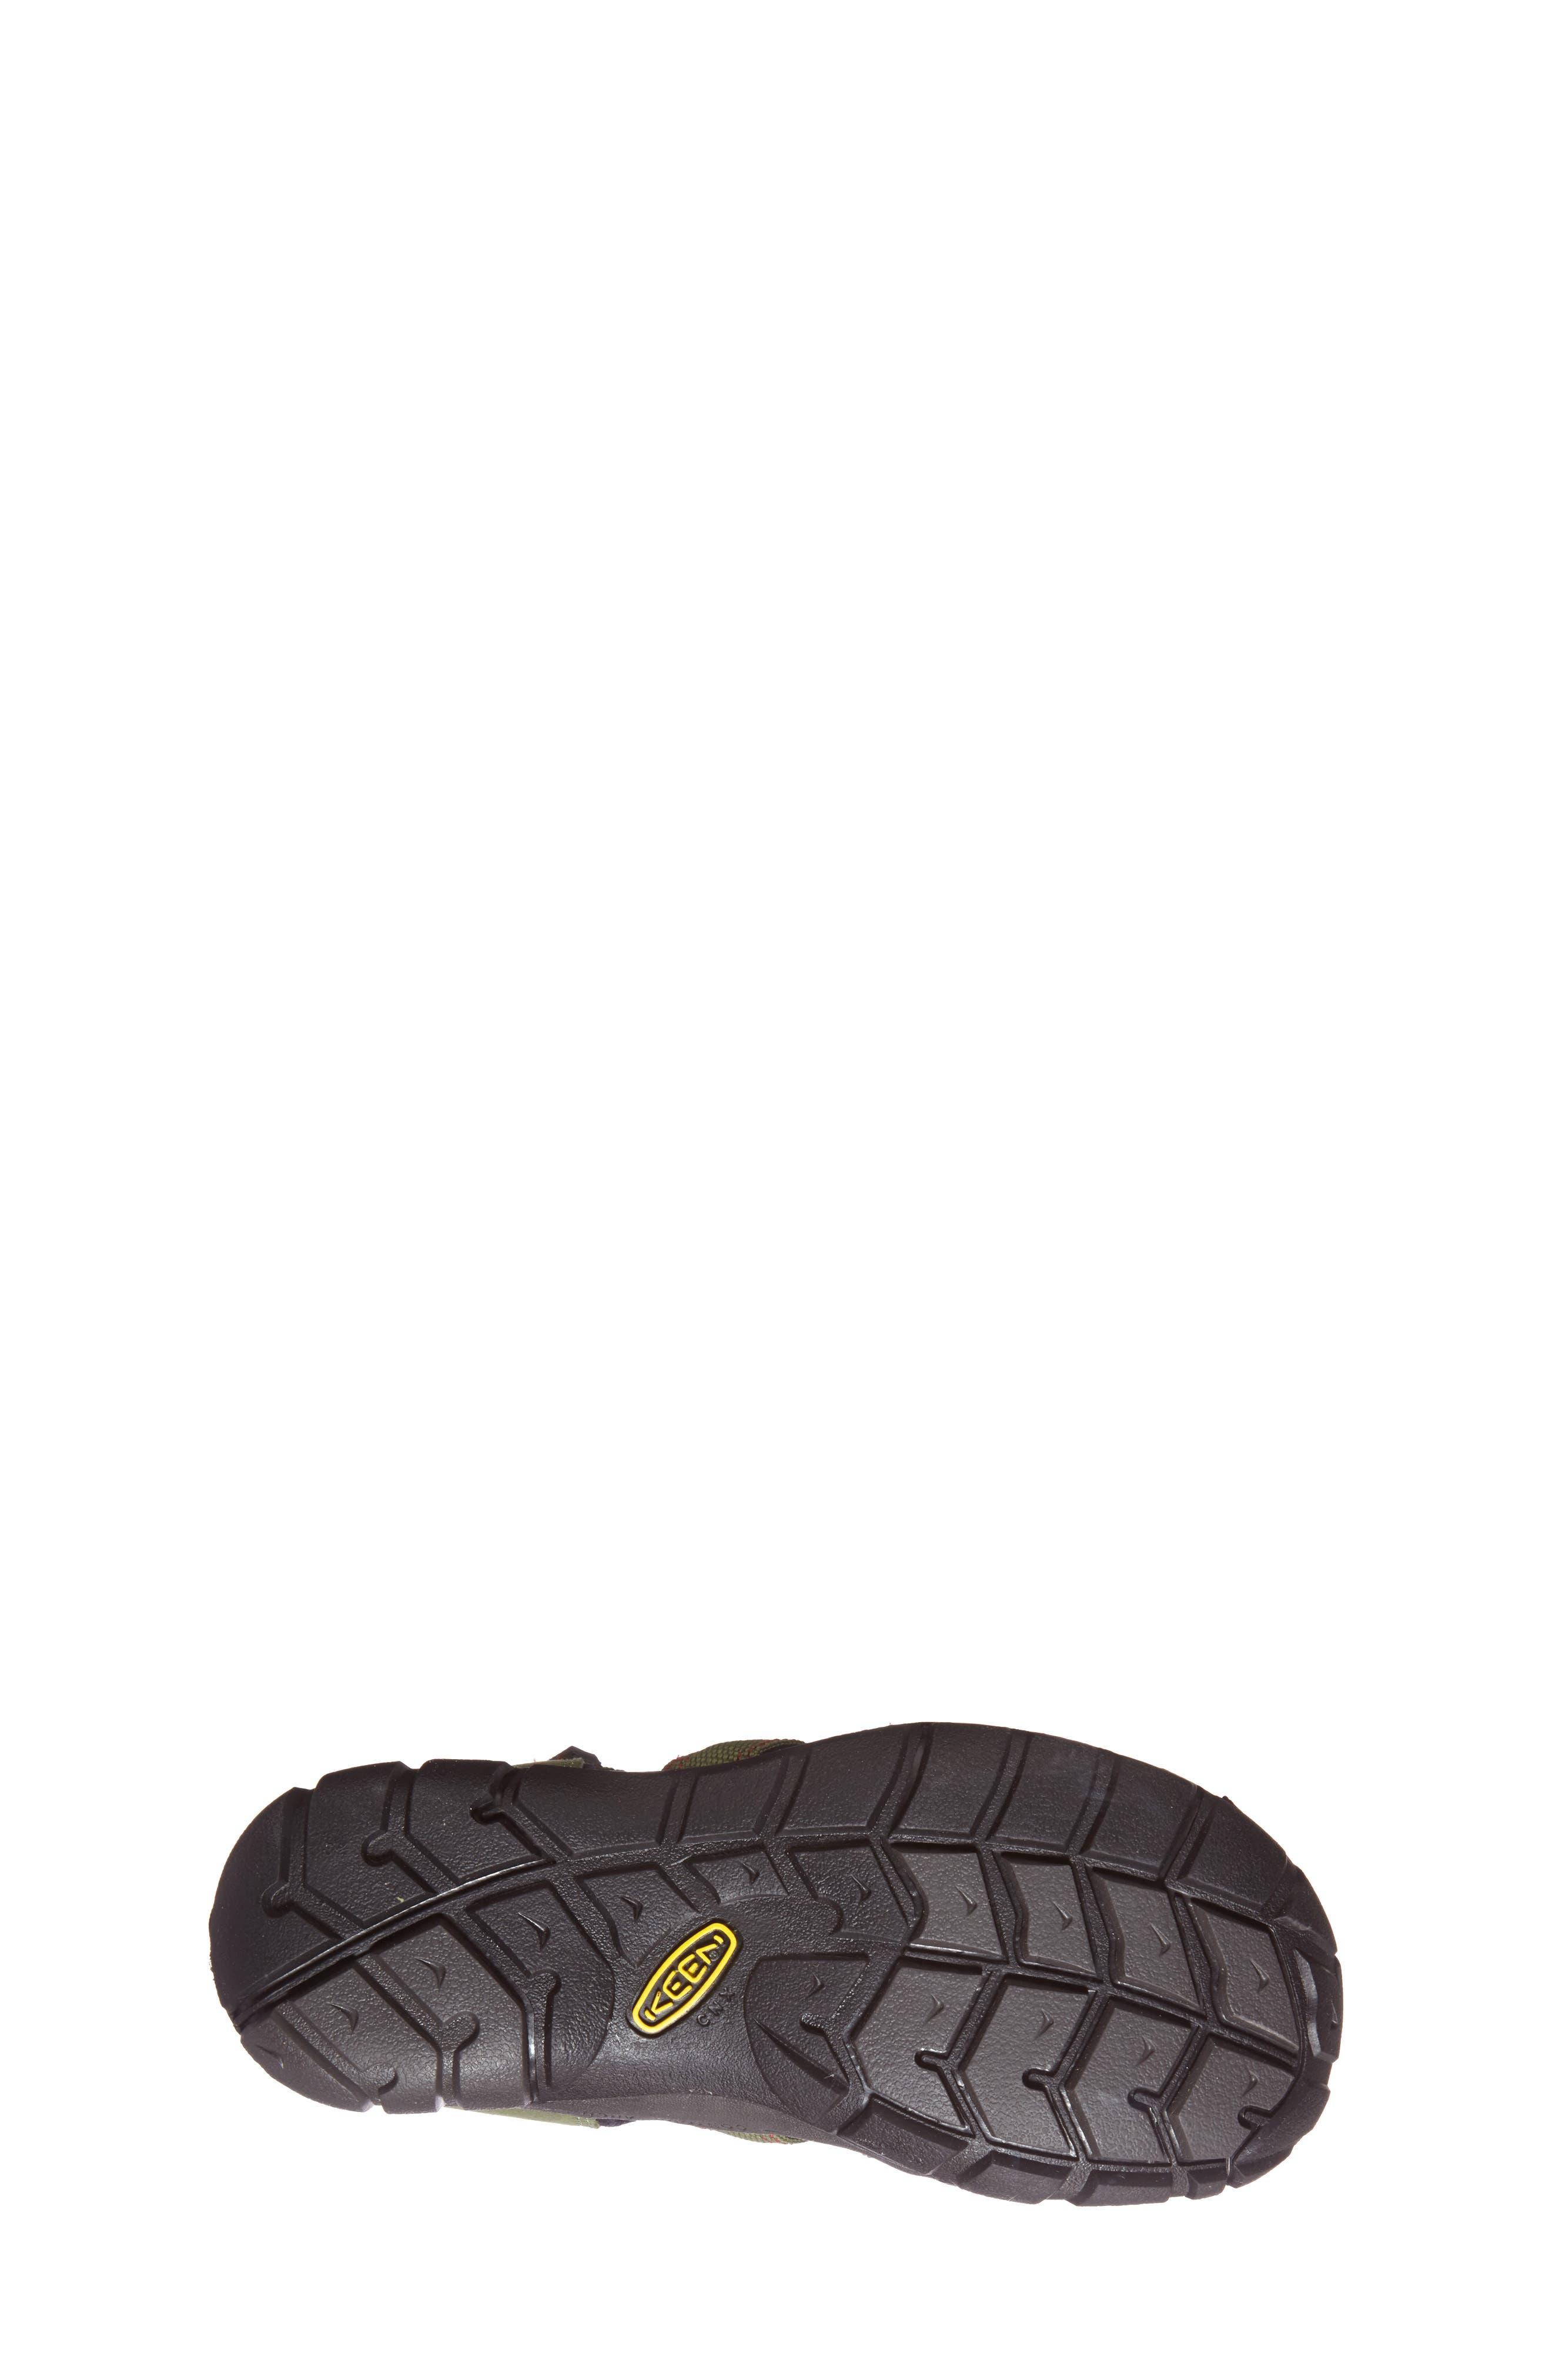 ,                             'Seacamp II' Water Friendly Sandal,                             Alternate thumbnail 143, color,                             311